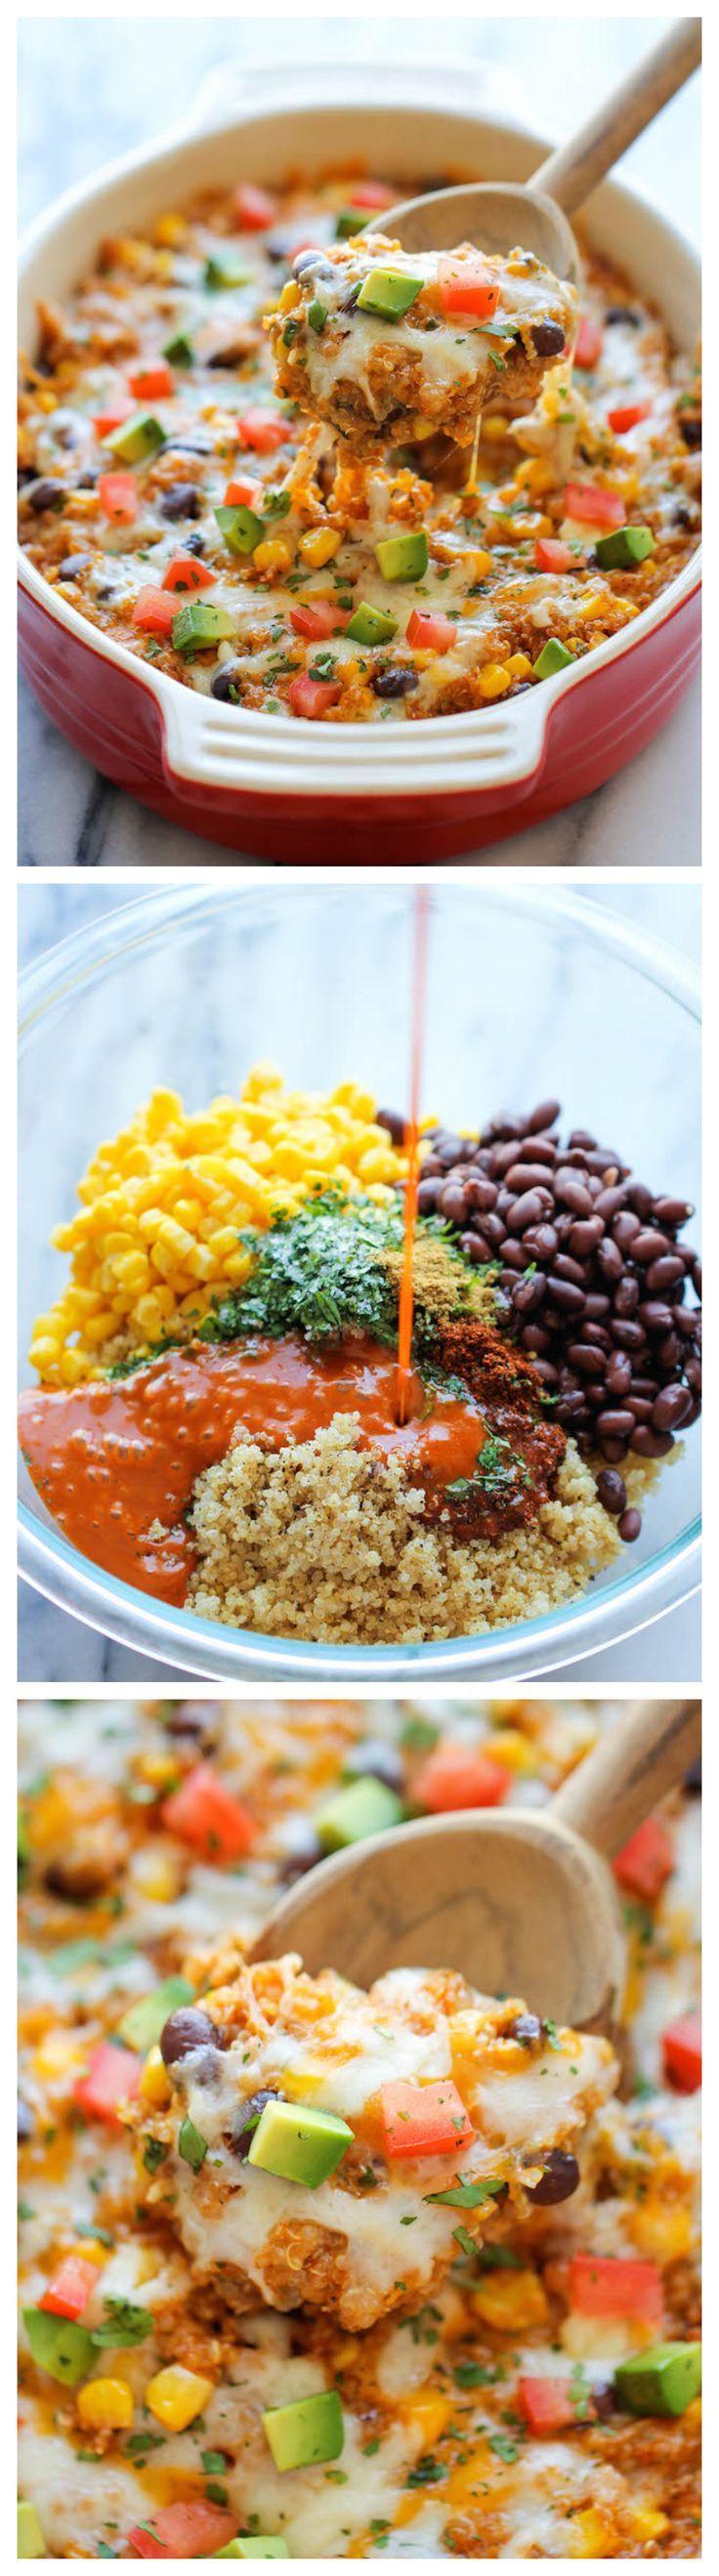 Quinoa Enchilada Casserole - Damn Delicious